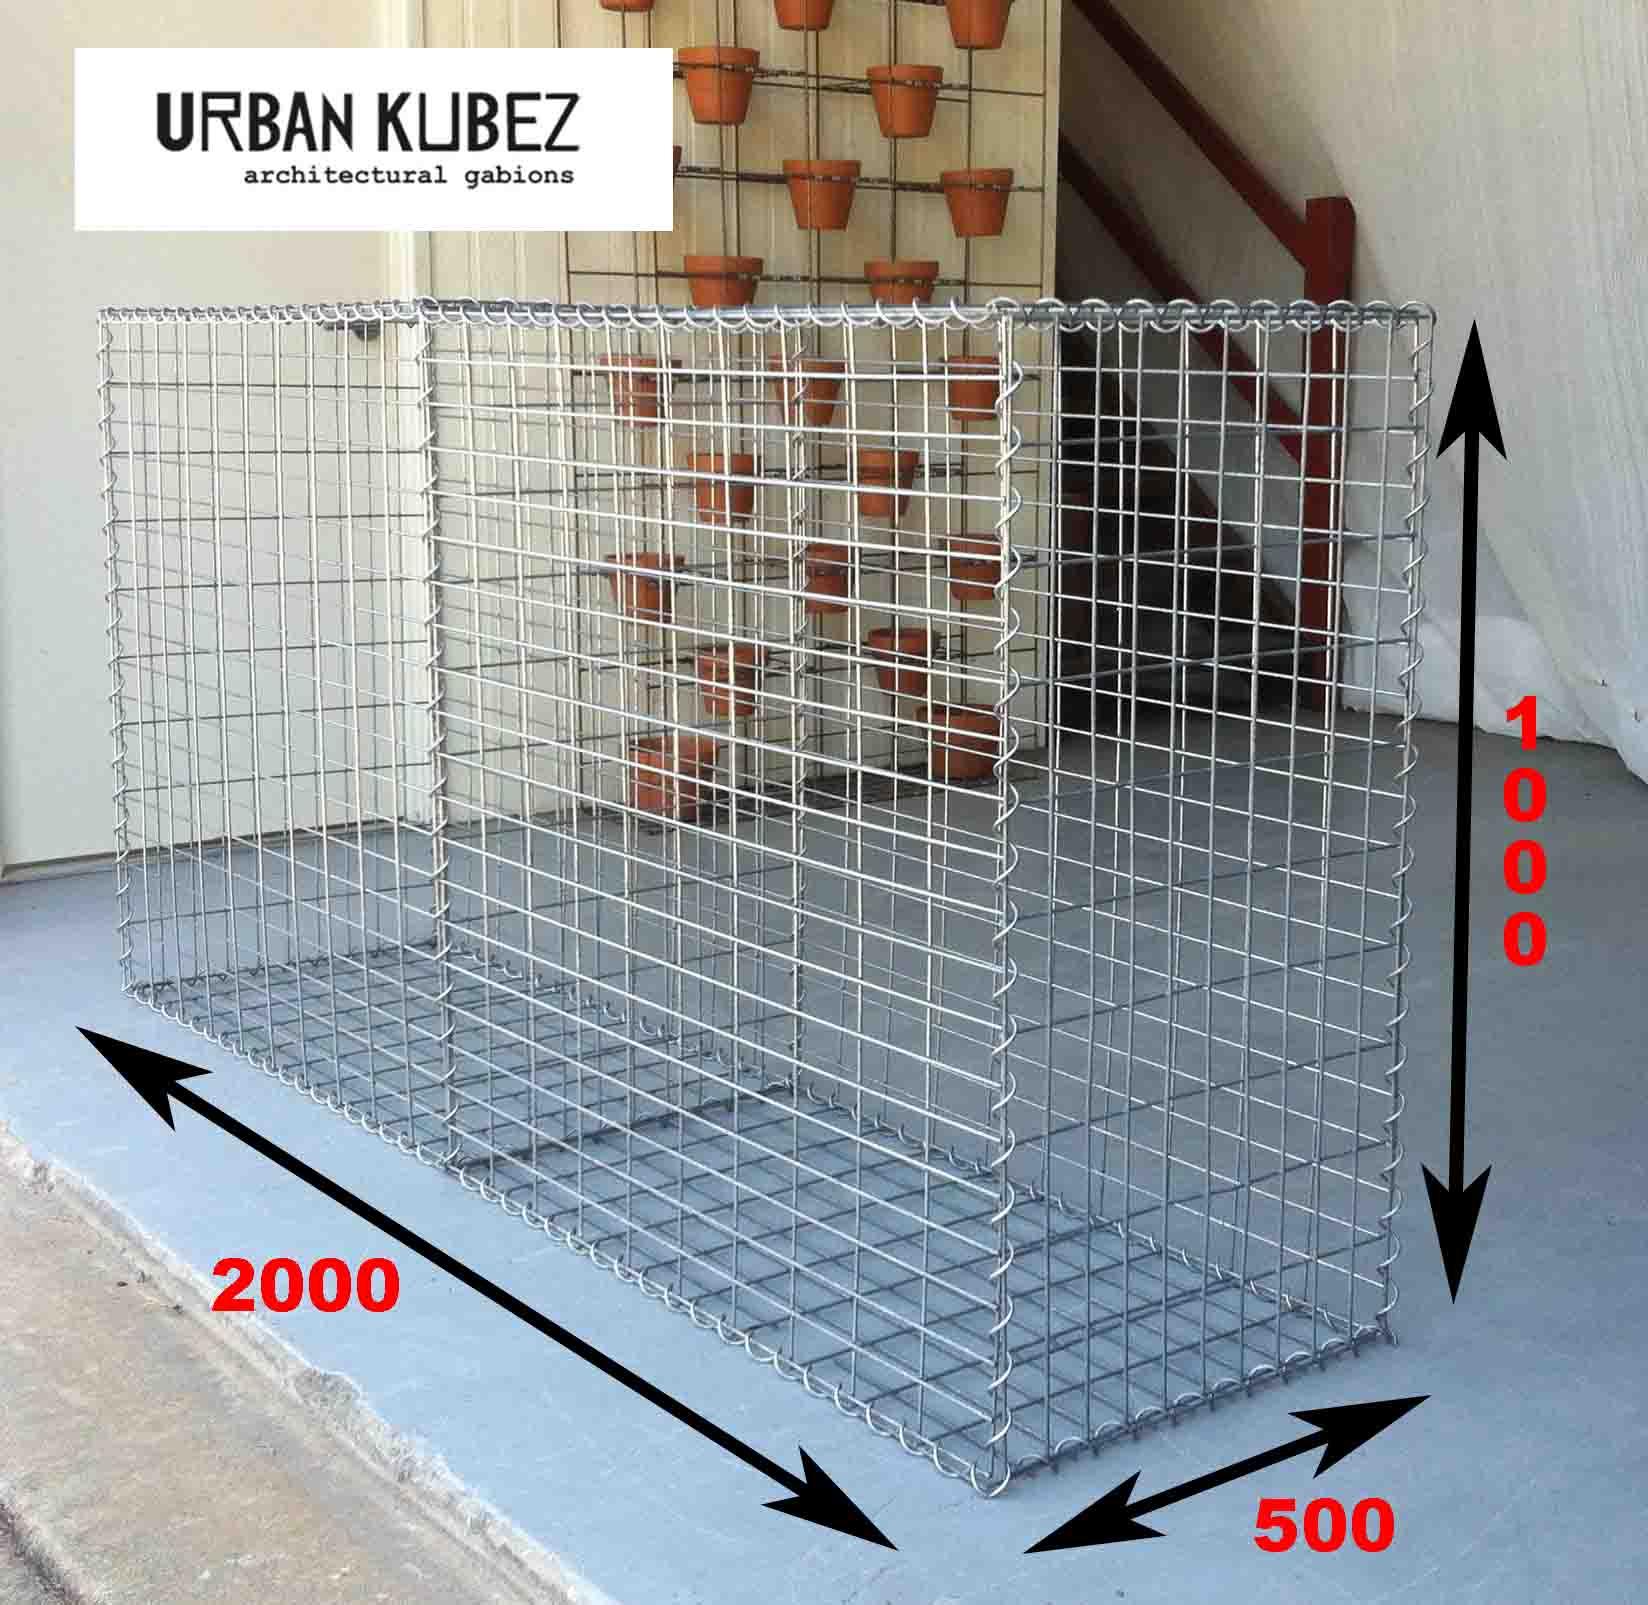 gabion cages, urban kubez, gabion basket, gabion rock, gabion retaining wall, gabion feature, gabion letterbox